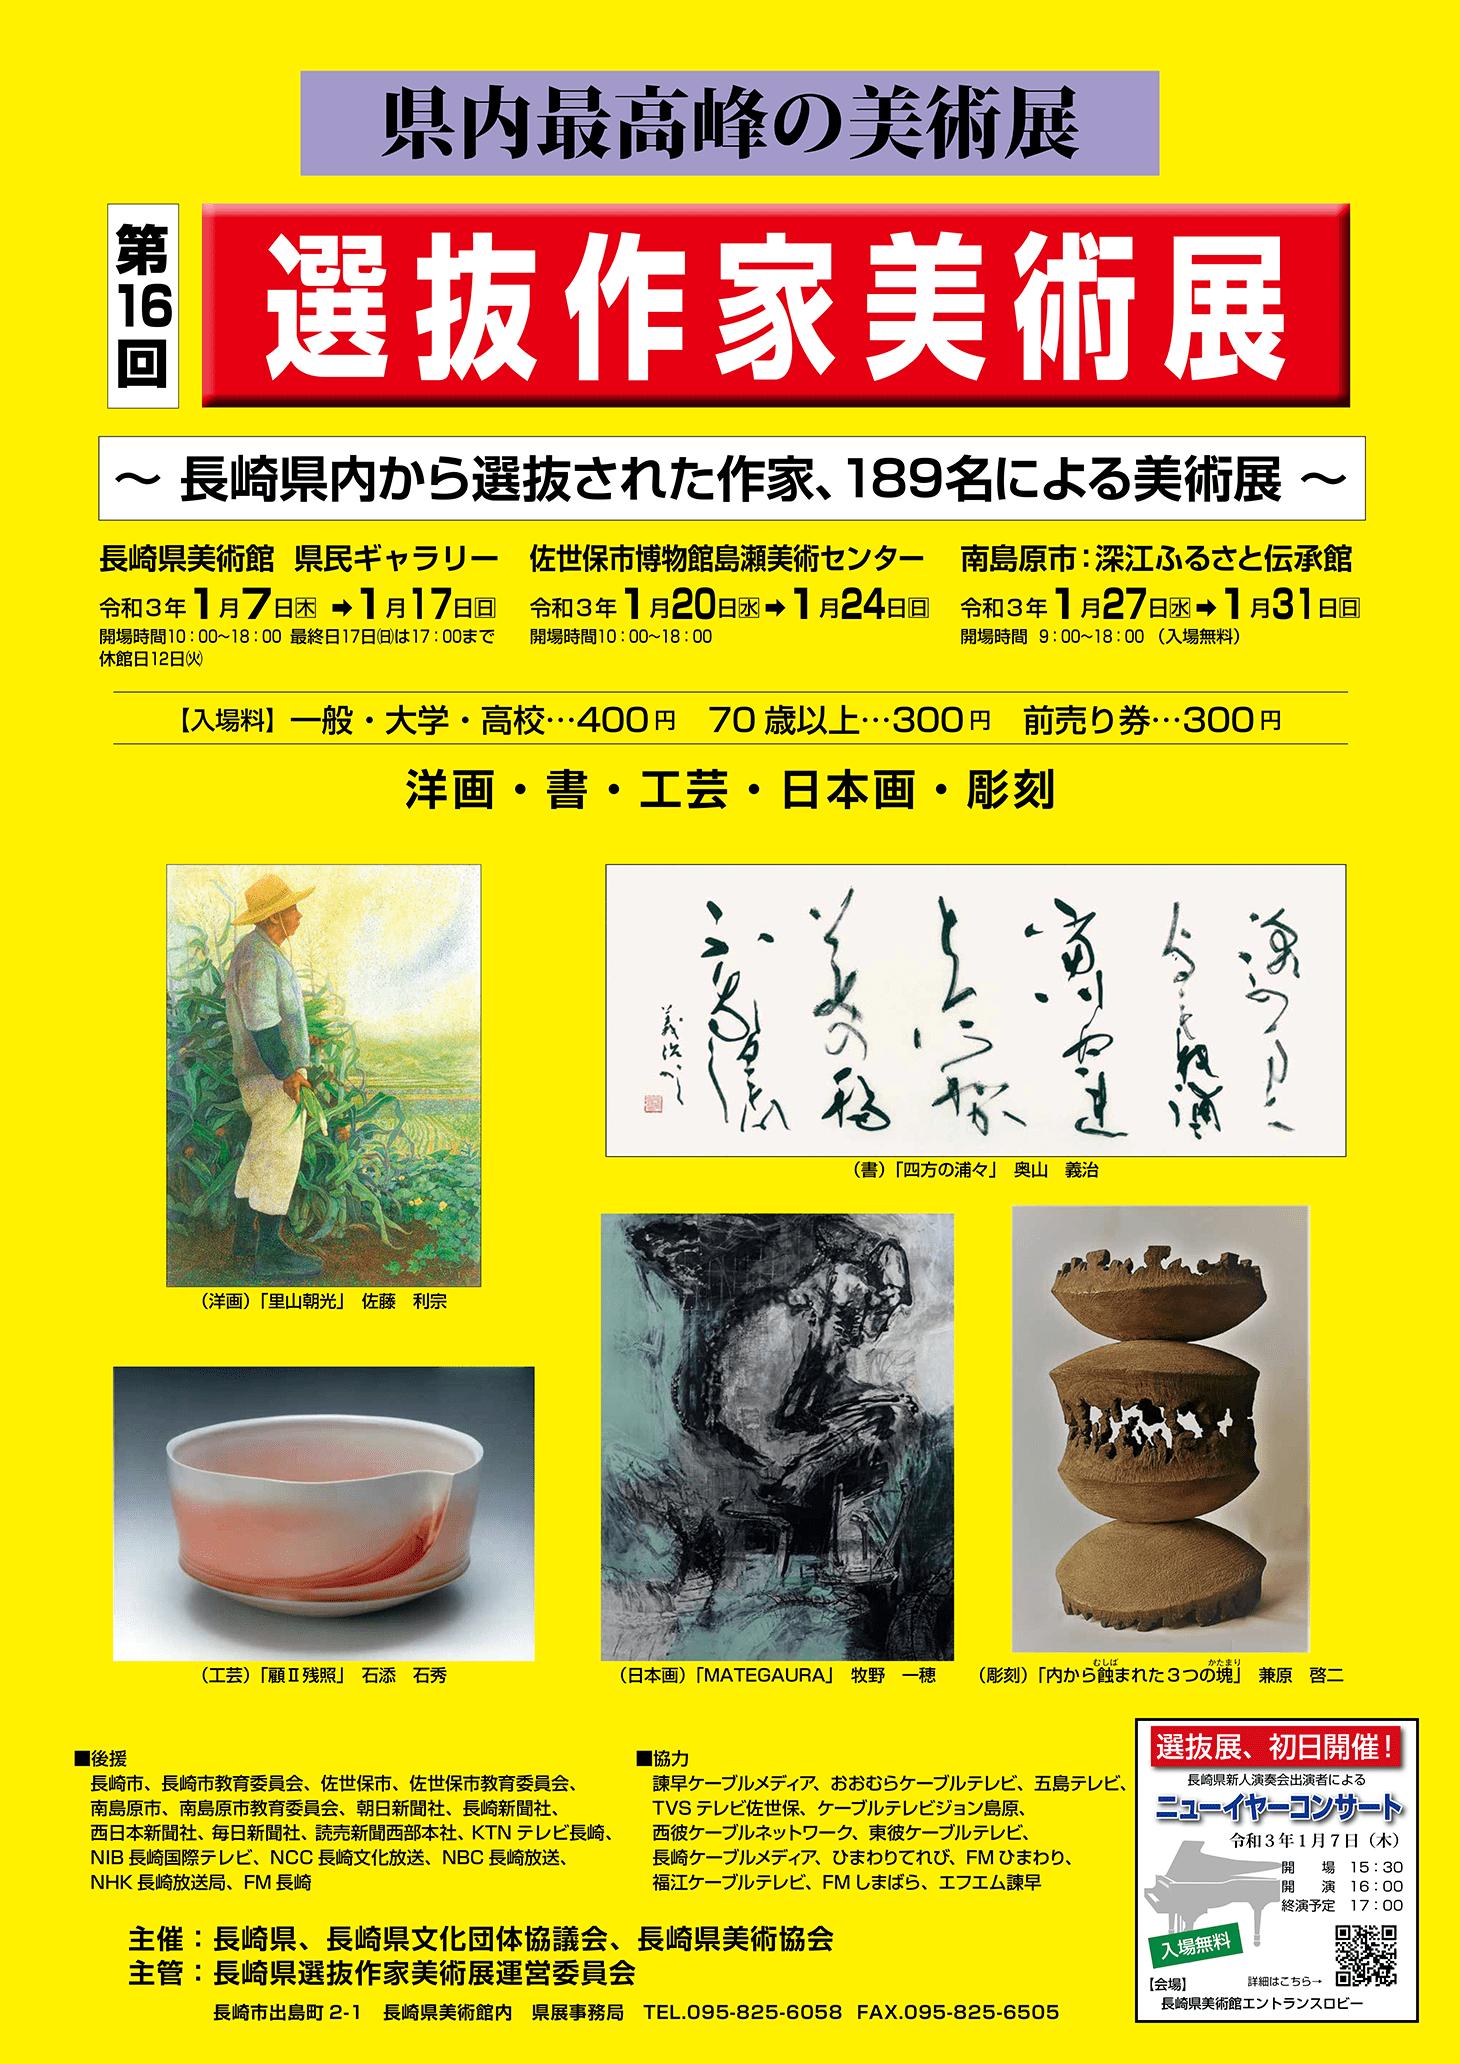 第16回 長崎県選抜作家美術展ポスター